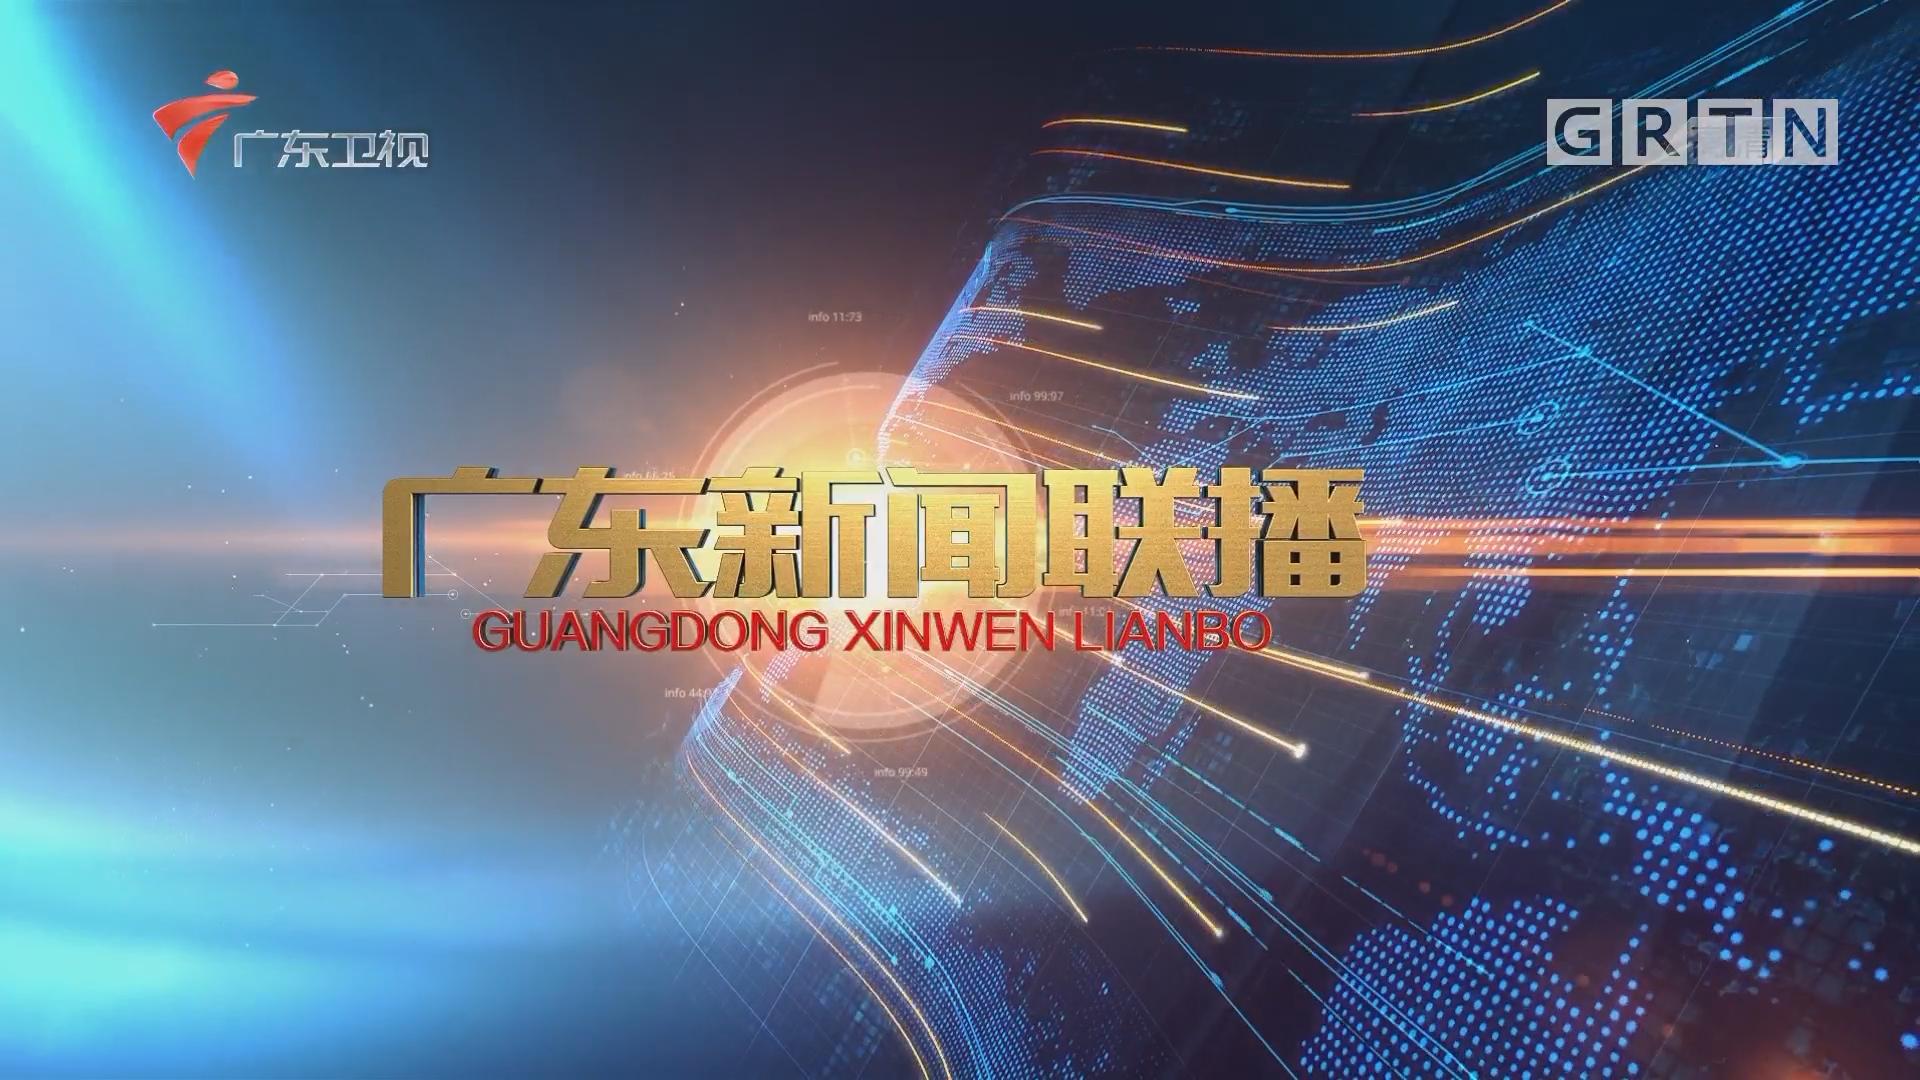 [HD][2019-03-03]广东新闻联播:全国政协十三届二次会议在北京开幕